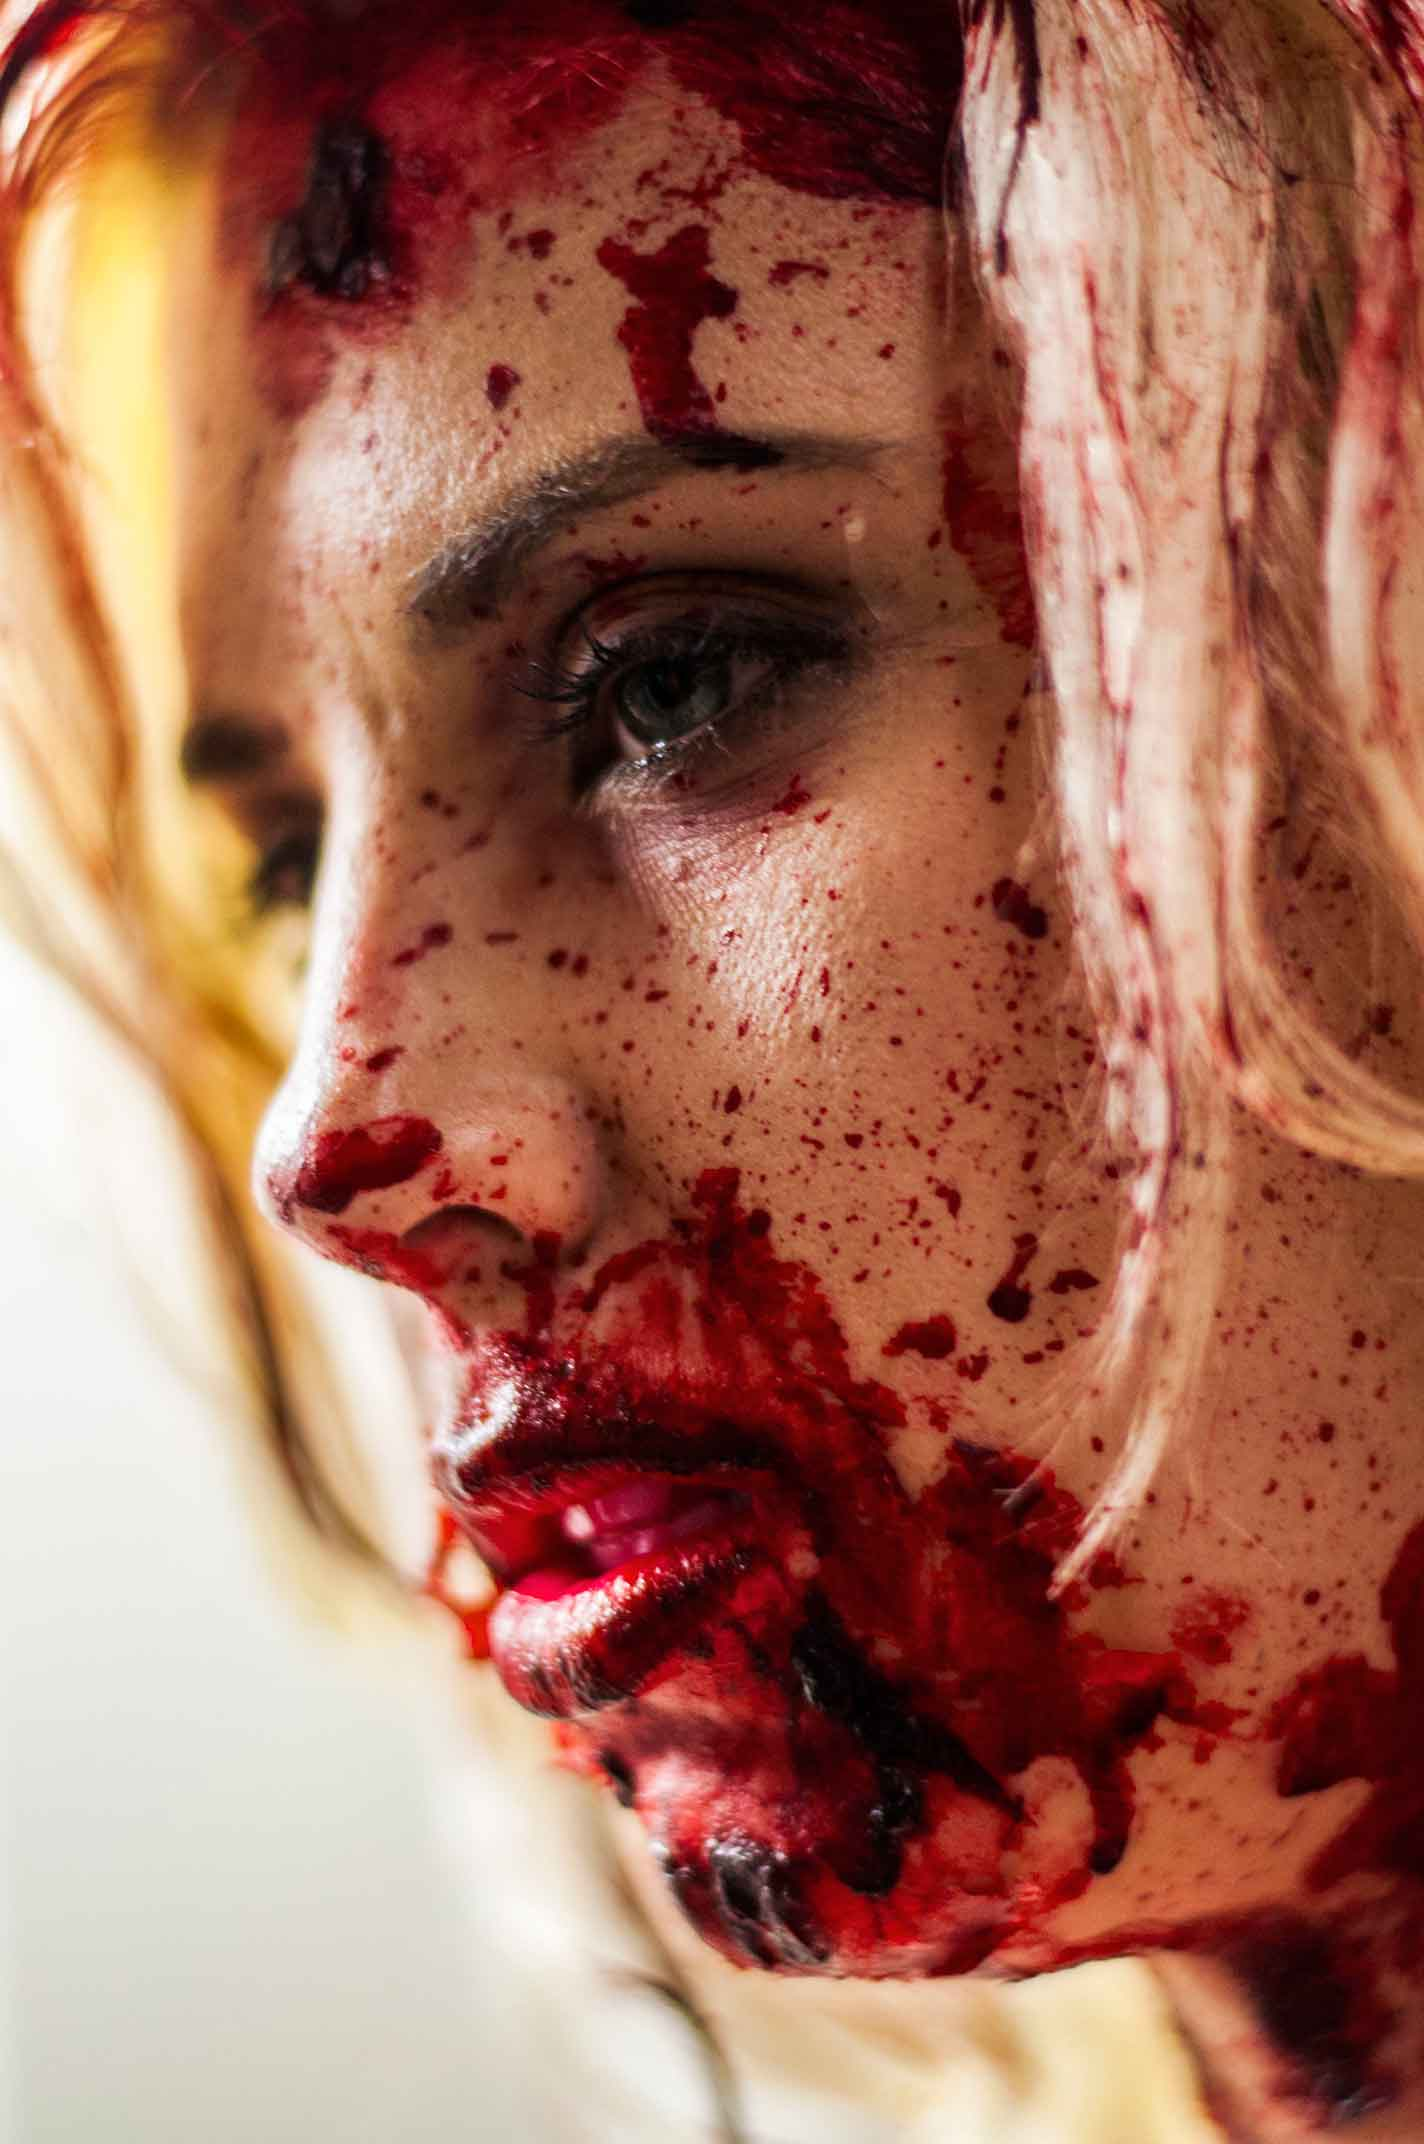 19_MeggieMaddock_Bloody.jpg